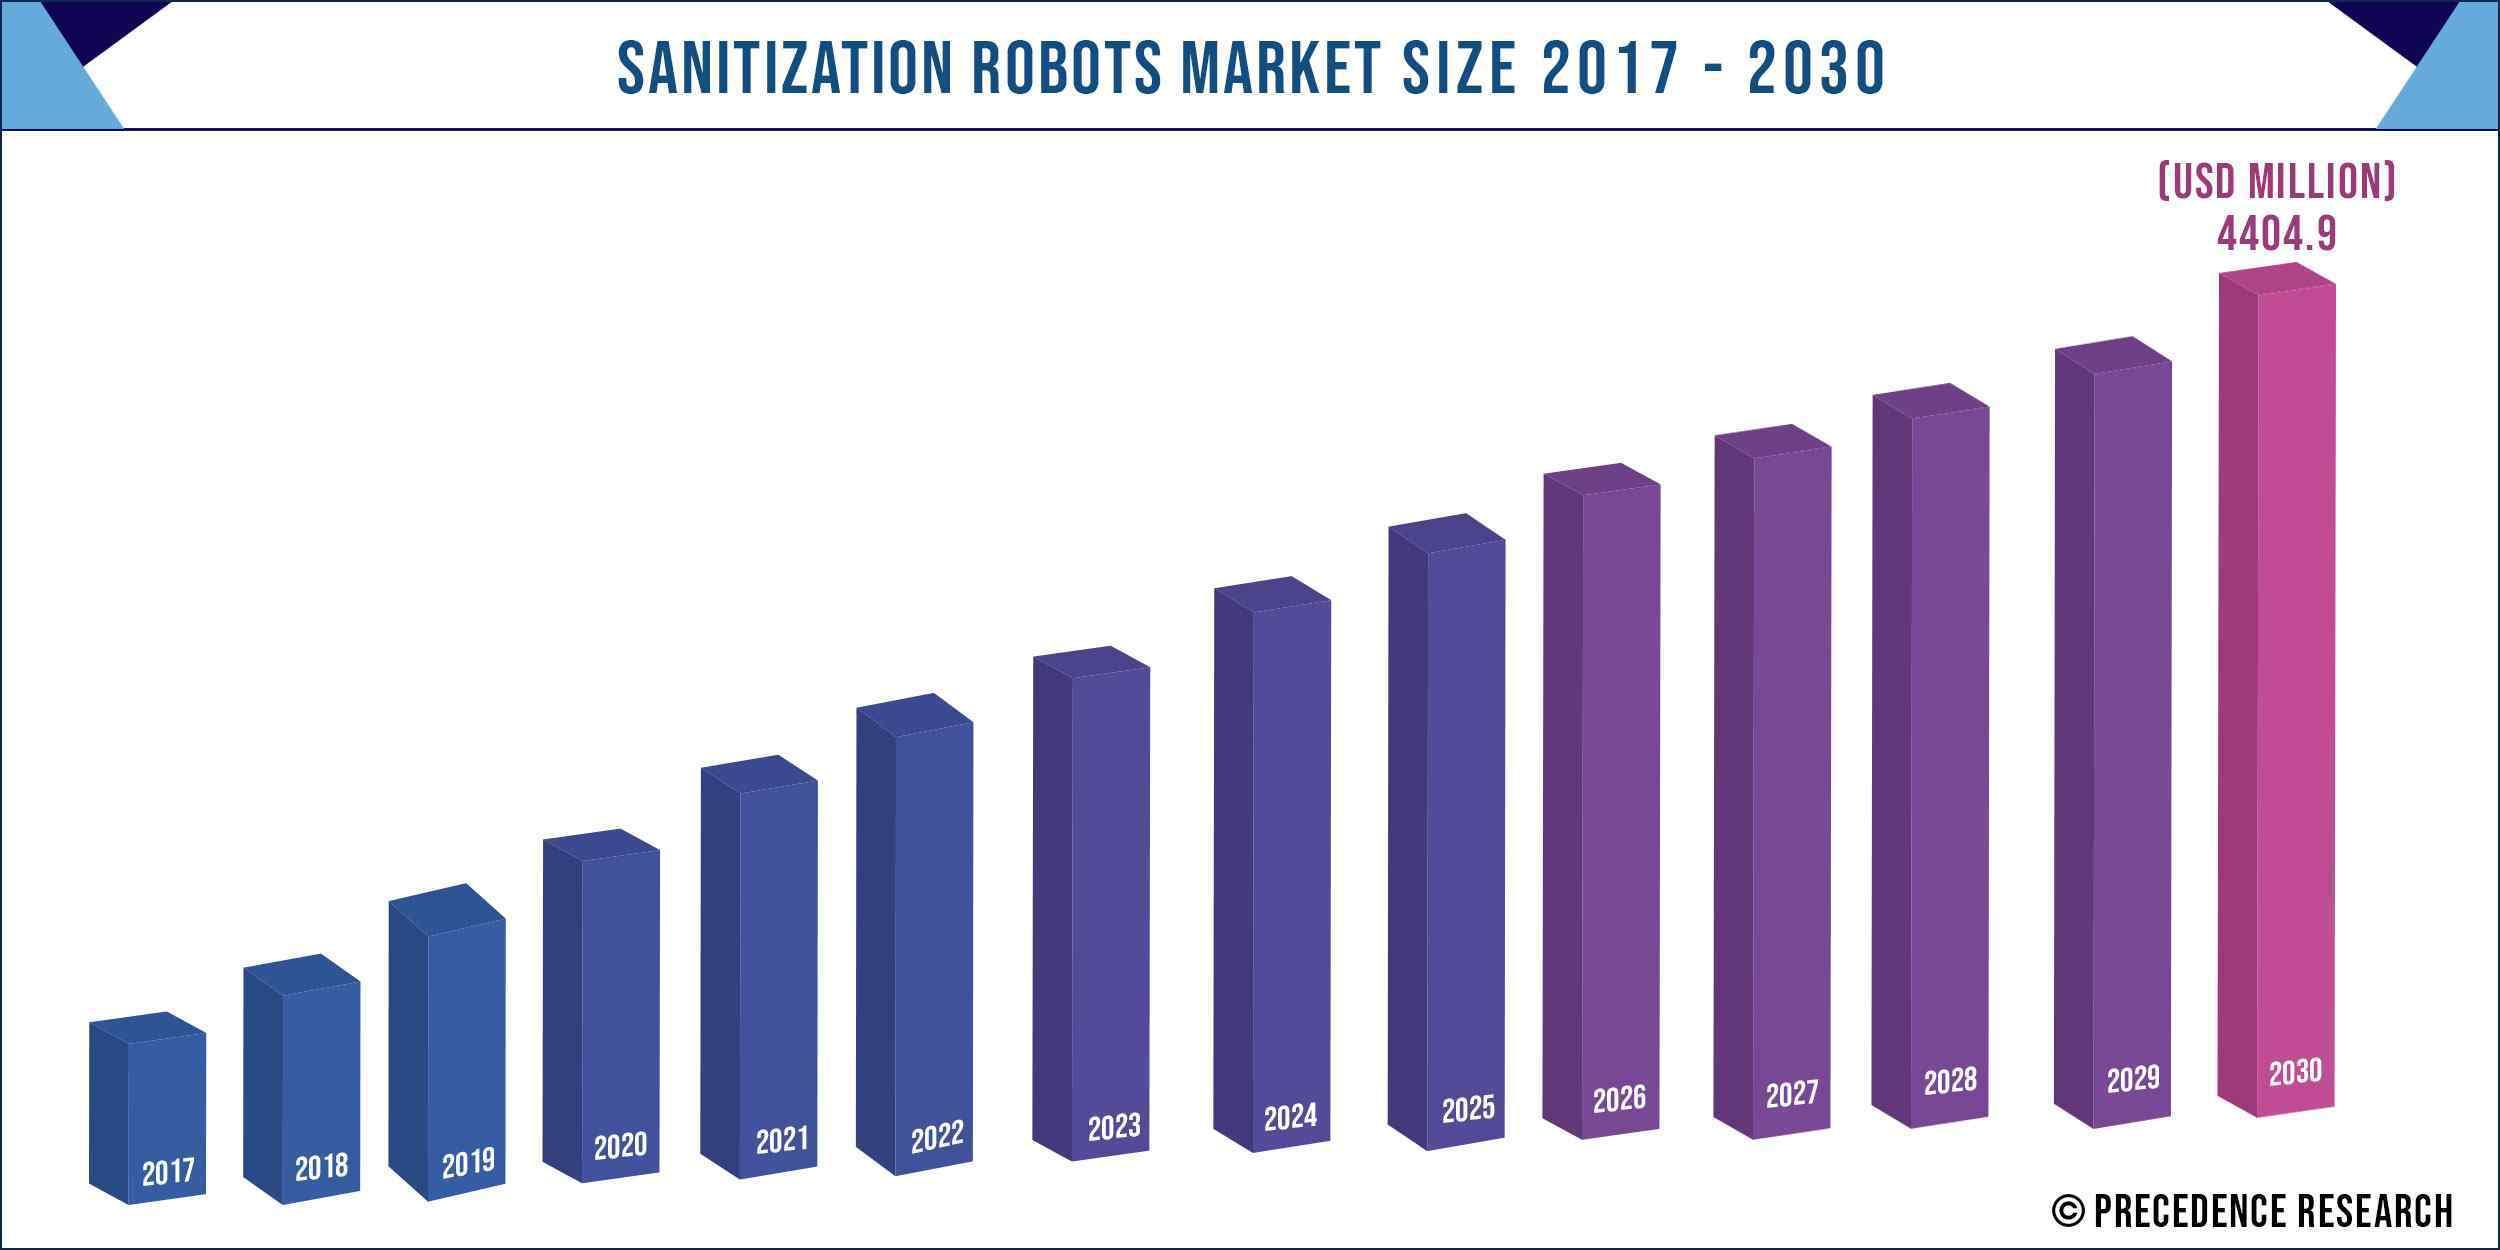 Sanitization Robots Market Size 2017-2030